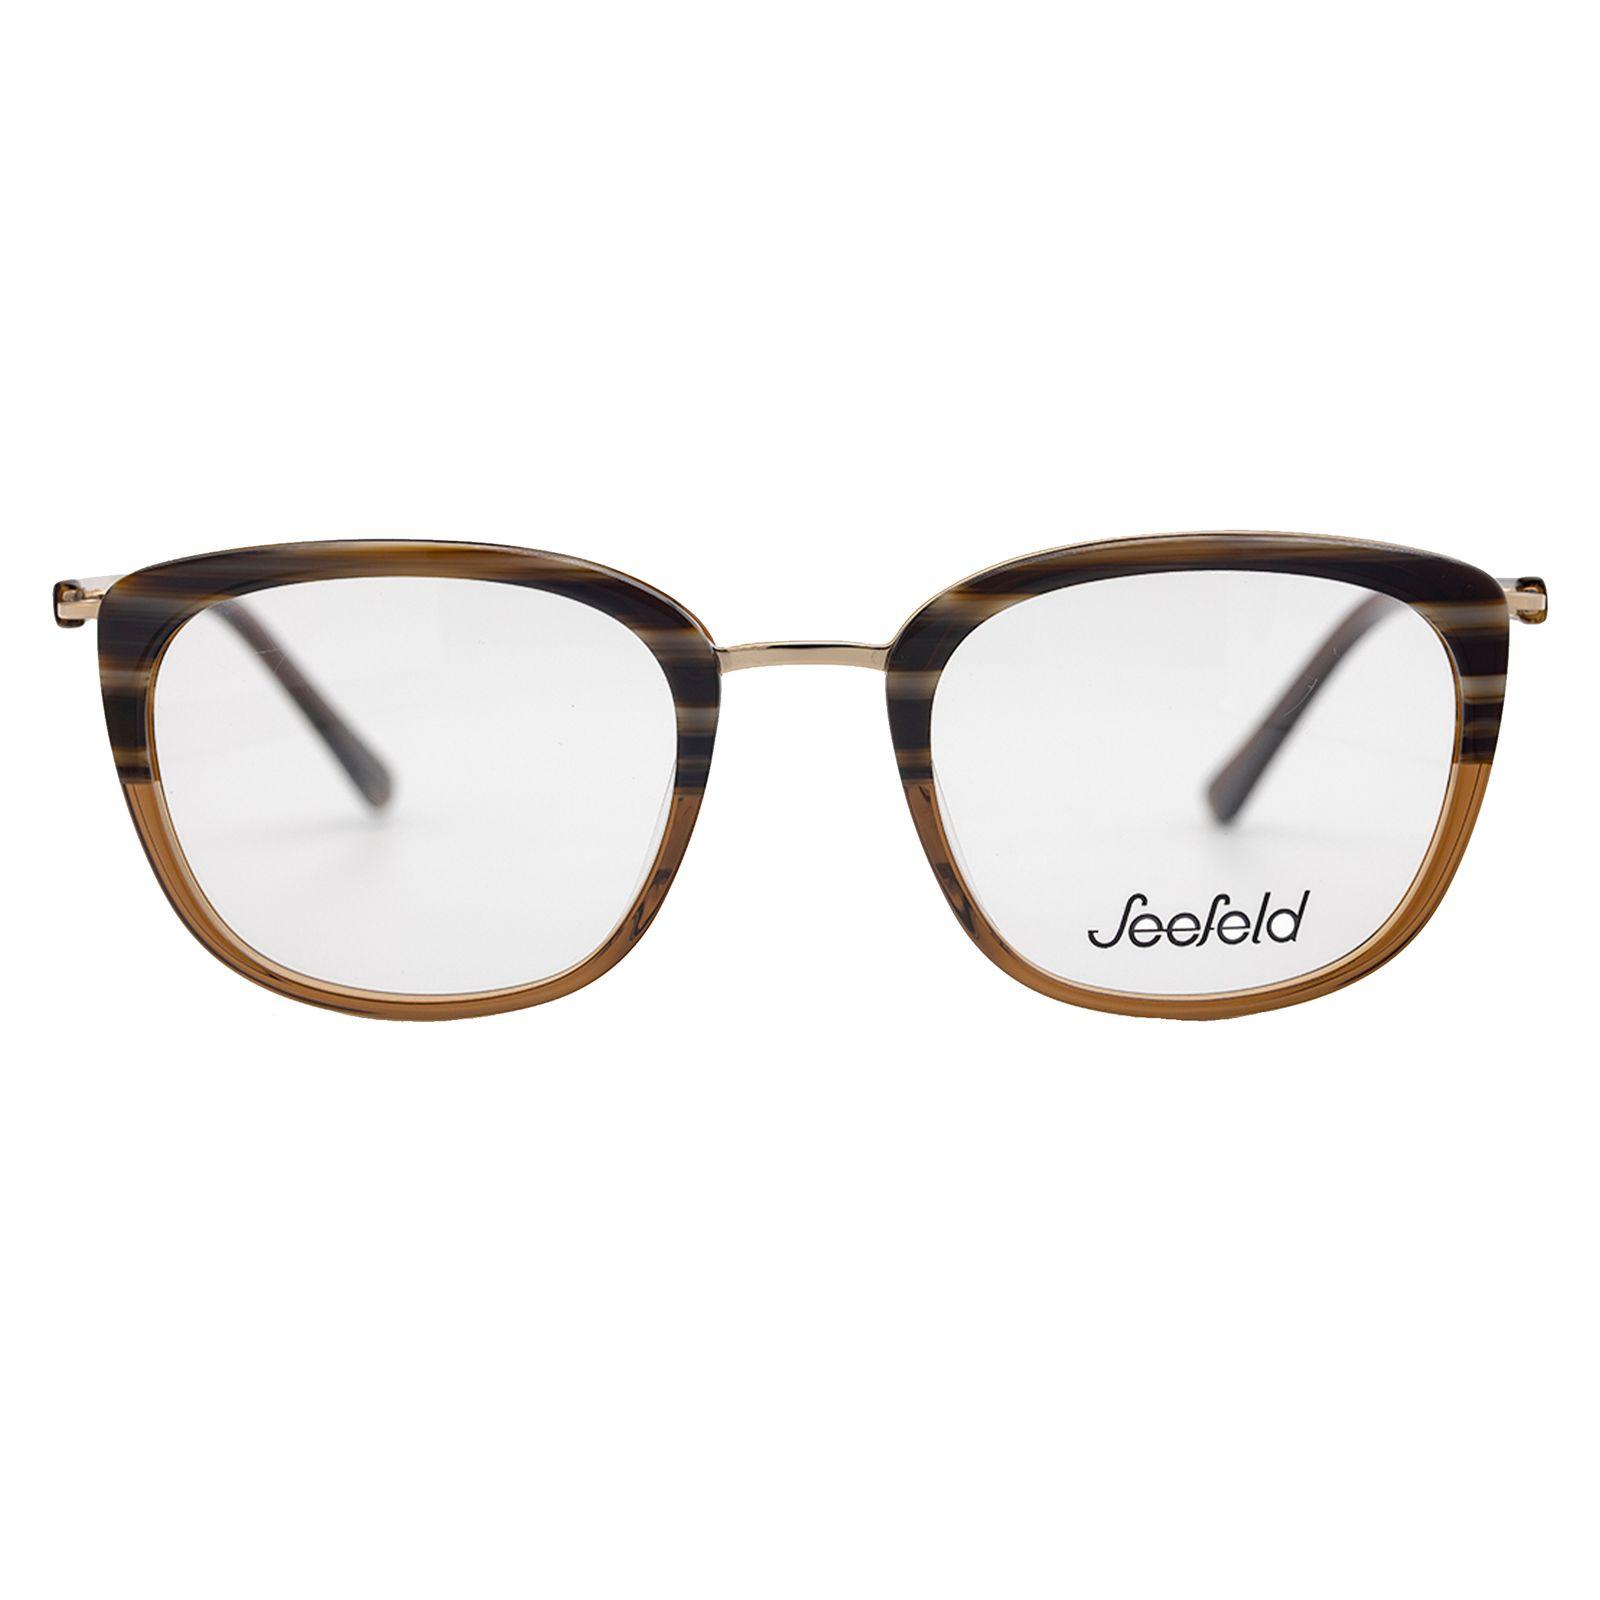 عینک طبی سیفلد مدل Mariazel C2 -  - 2